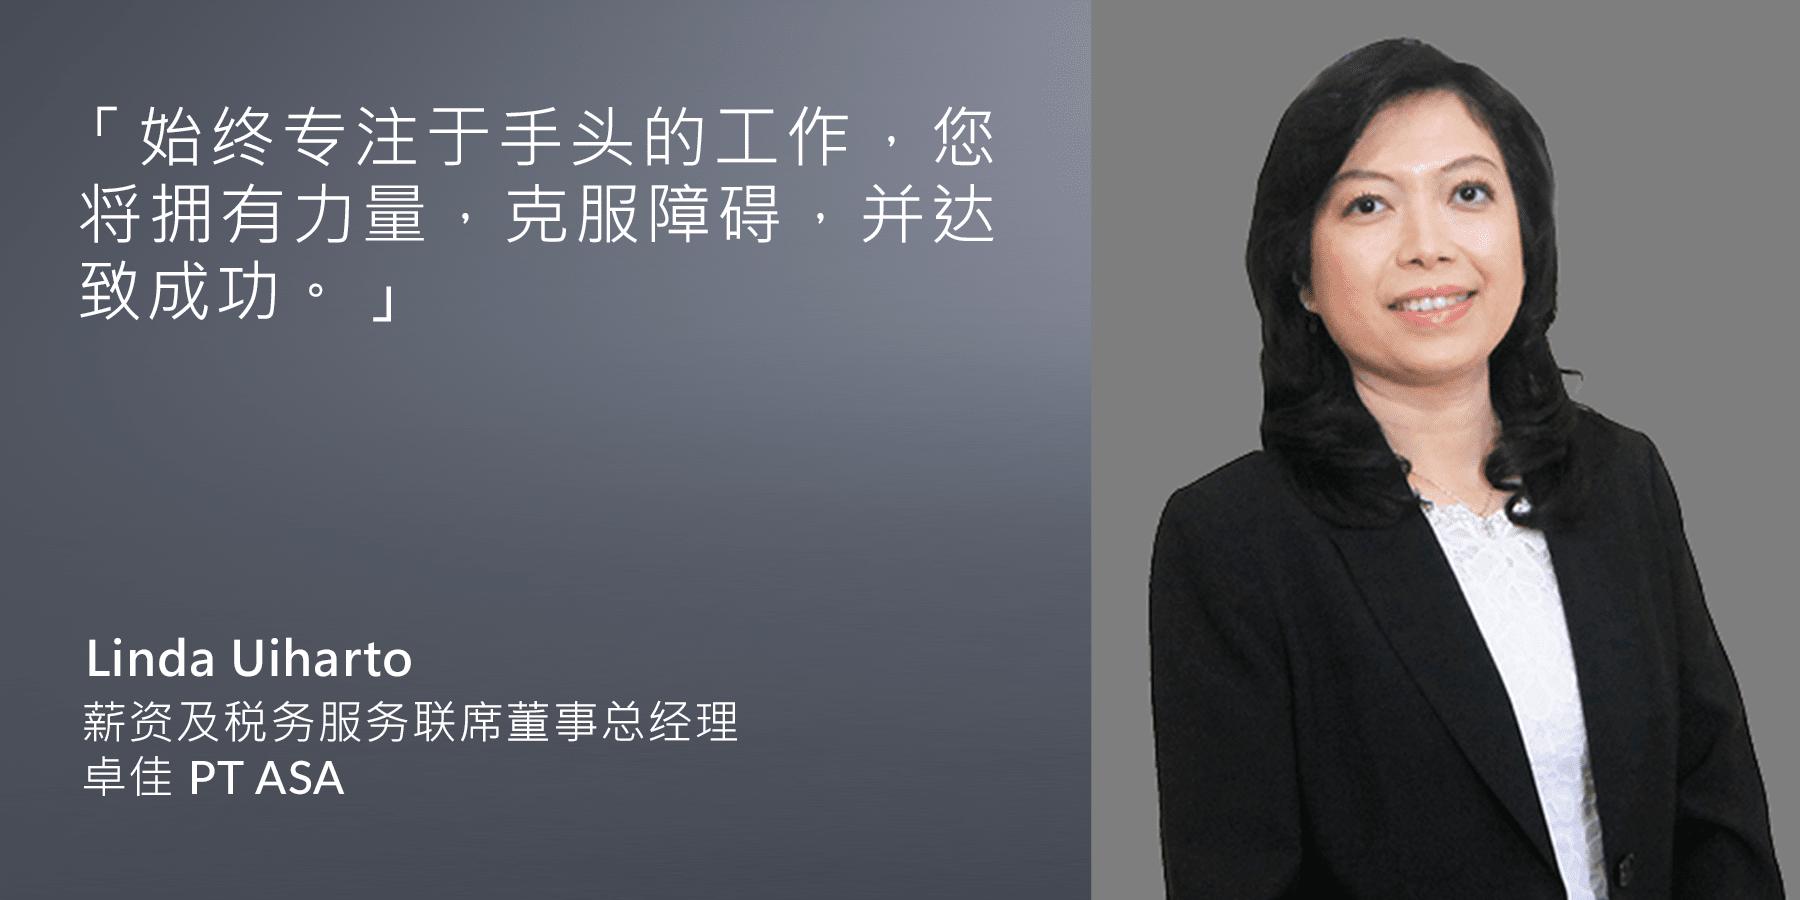 Linda Uiharto - 薪资及税务服务联席董事总经理 - 卓佳 PT ASA